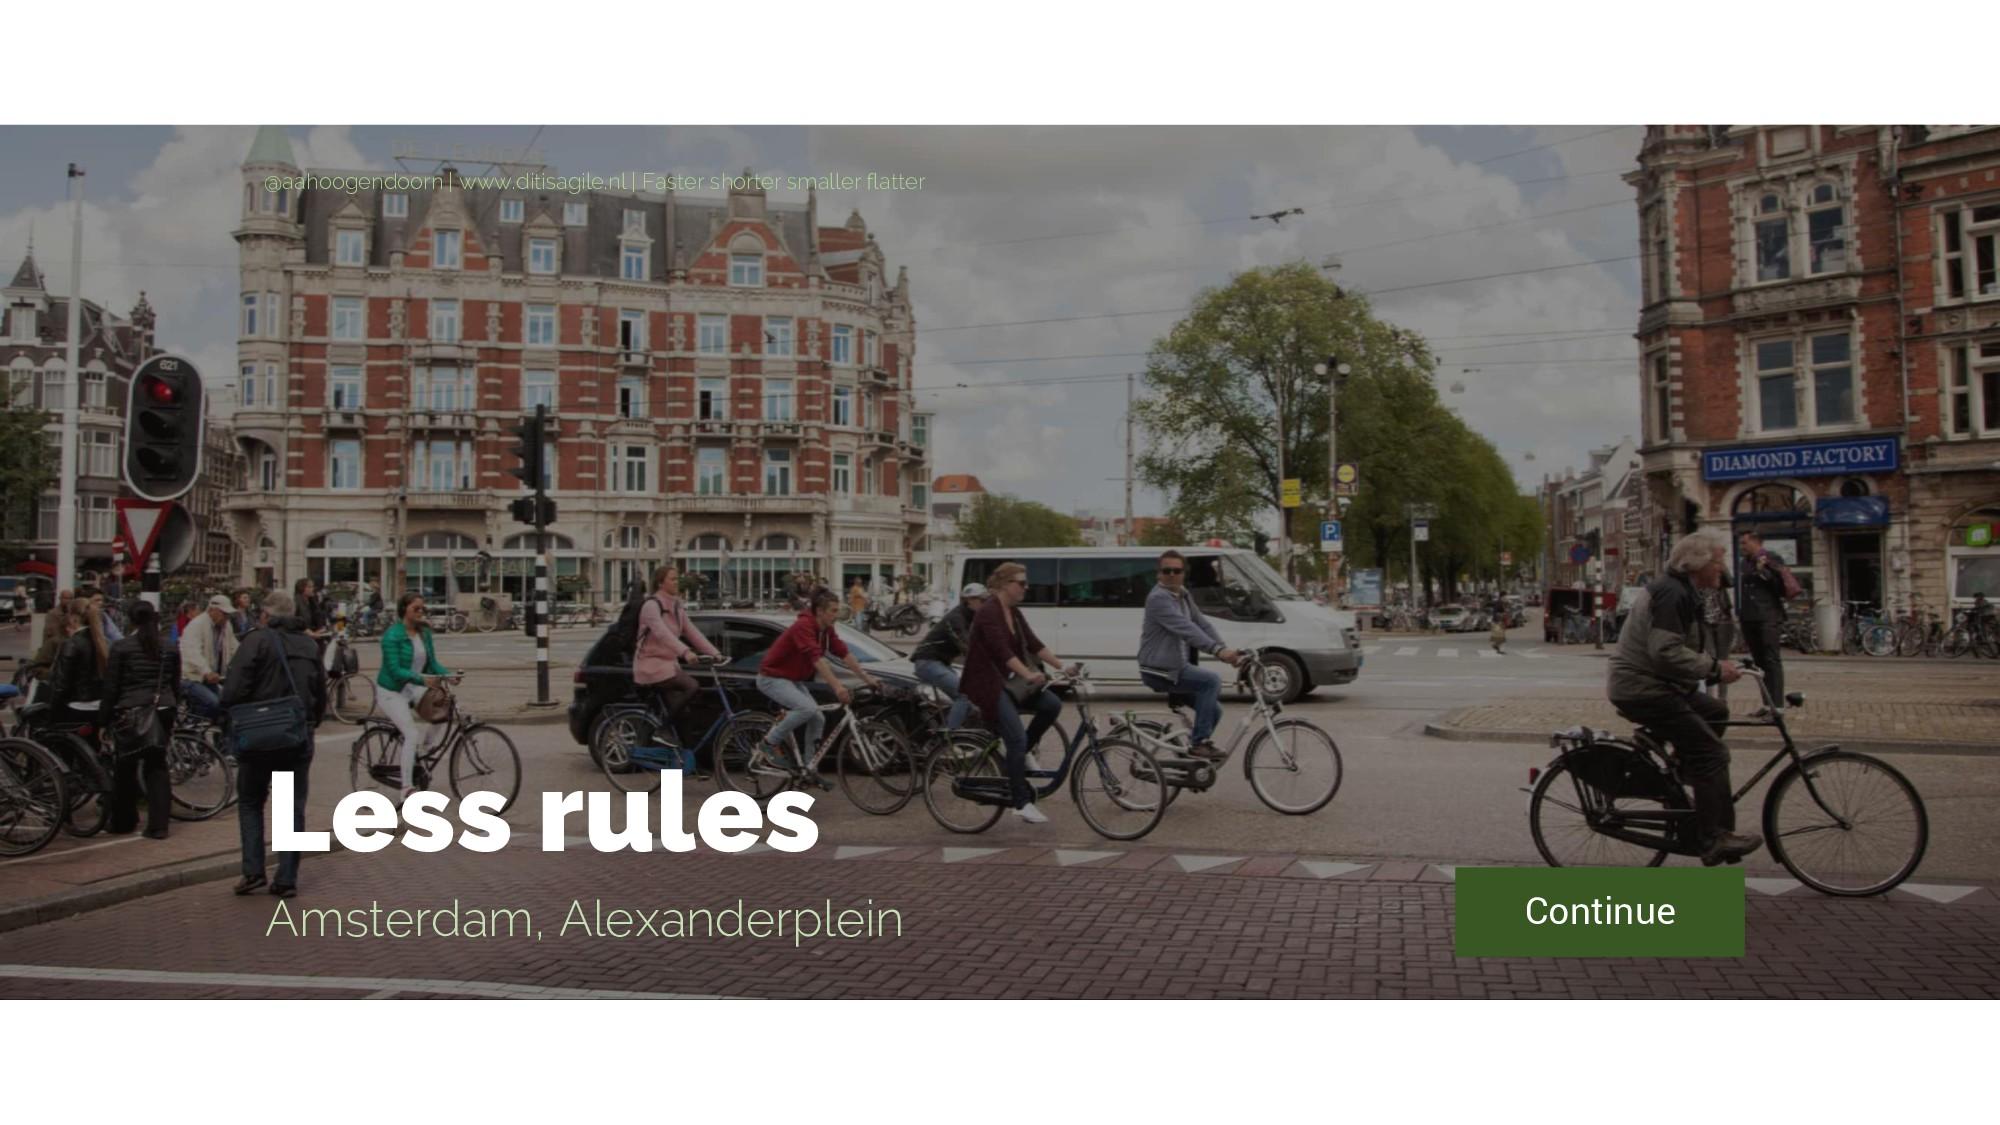 Less rules Amsterdam, Alexanderplein Continue @...